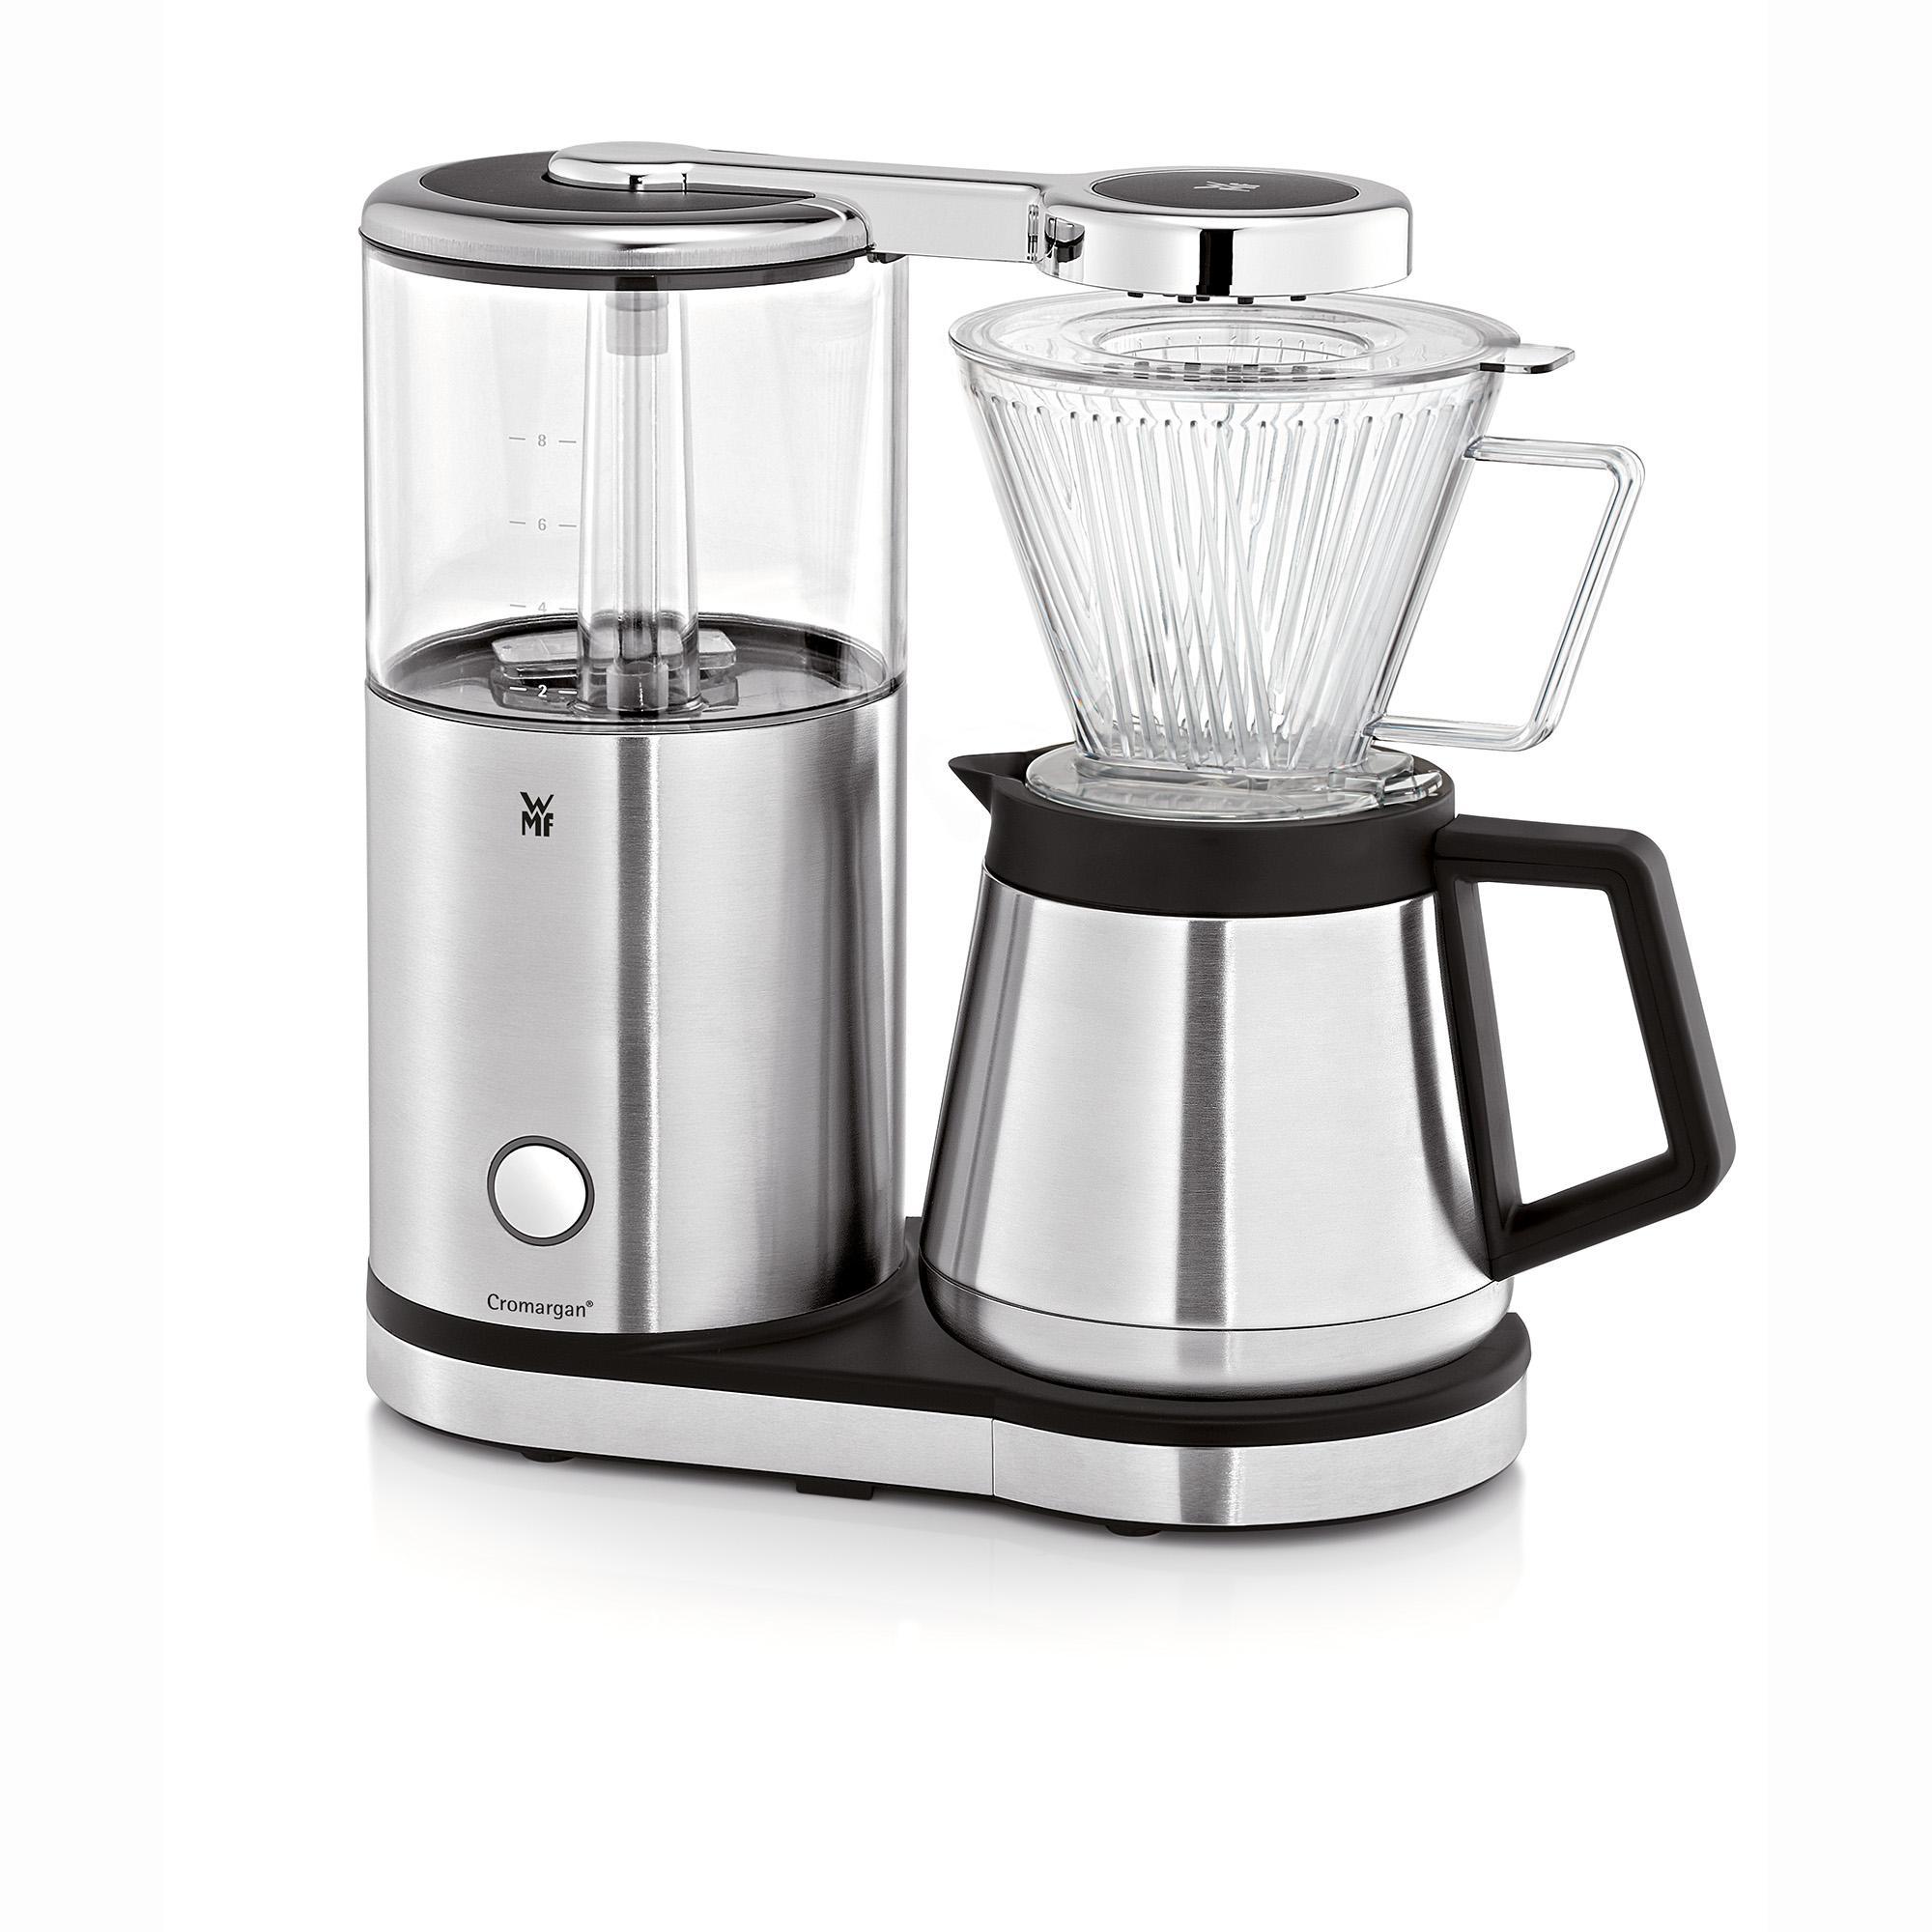 wmf aromamaster kaffeemaschine mit thermoskanne filterkaffee 10 tassen tropfstopp. Black Bedroom Furniture Sets. Home Design Ideas